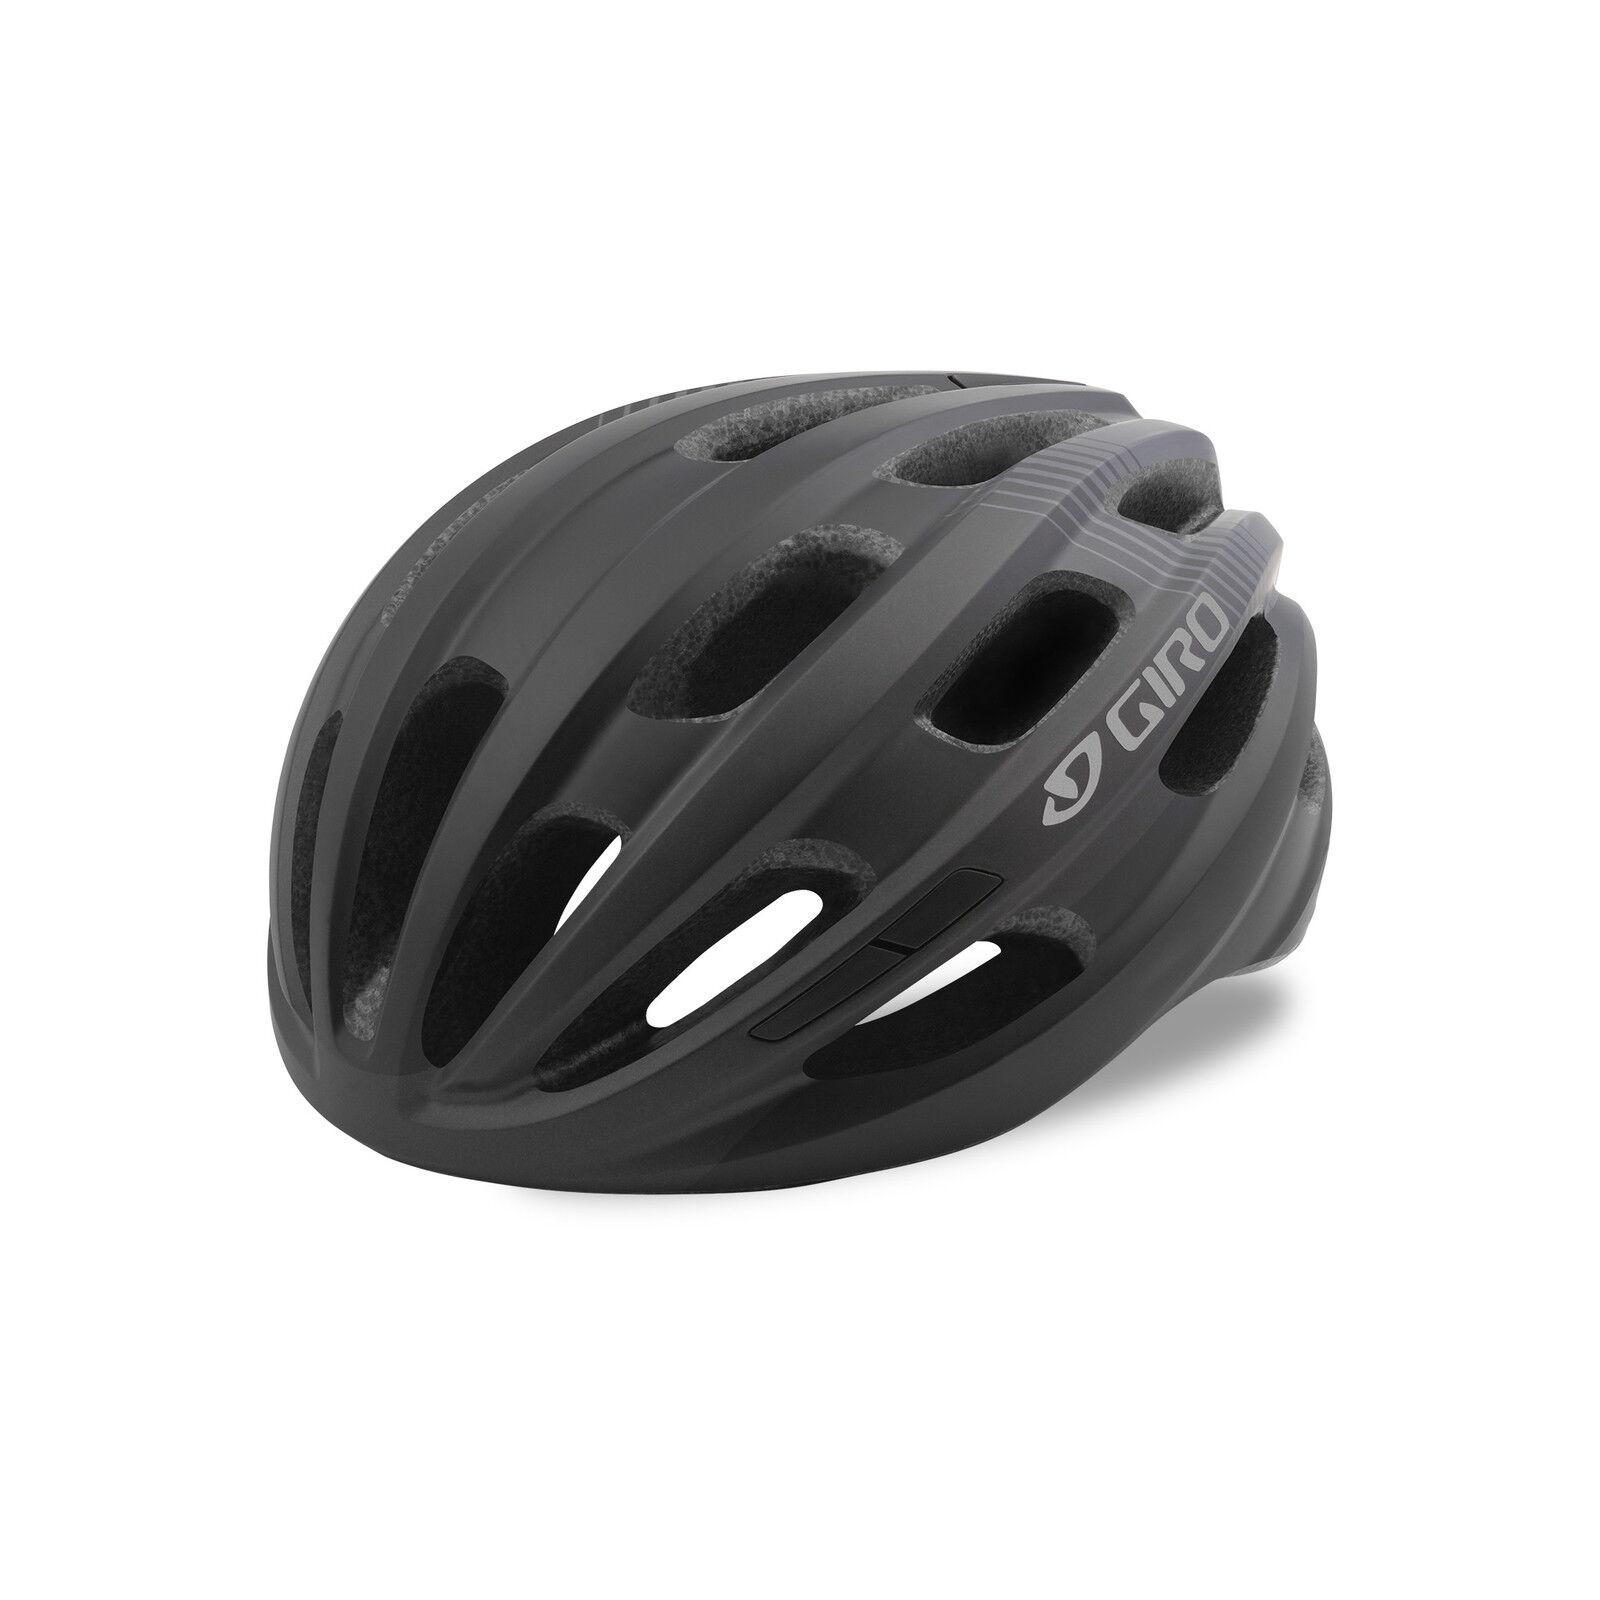 Giro isode Bicicletta Casco Tg. 5461cm NERO 2019